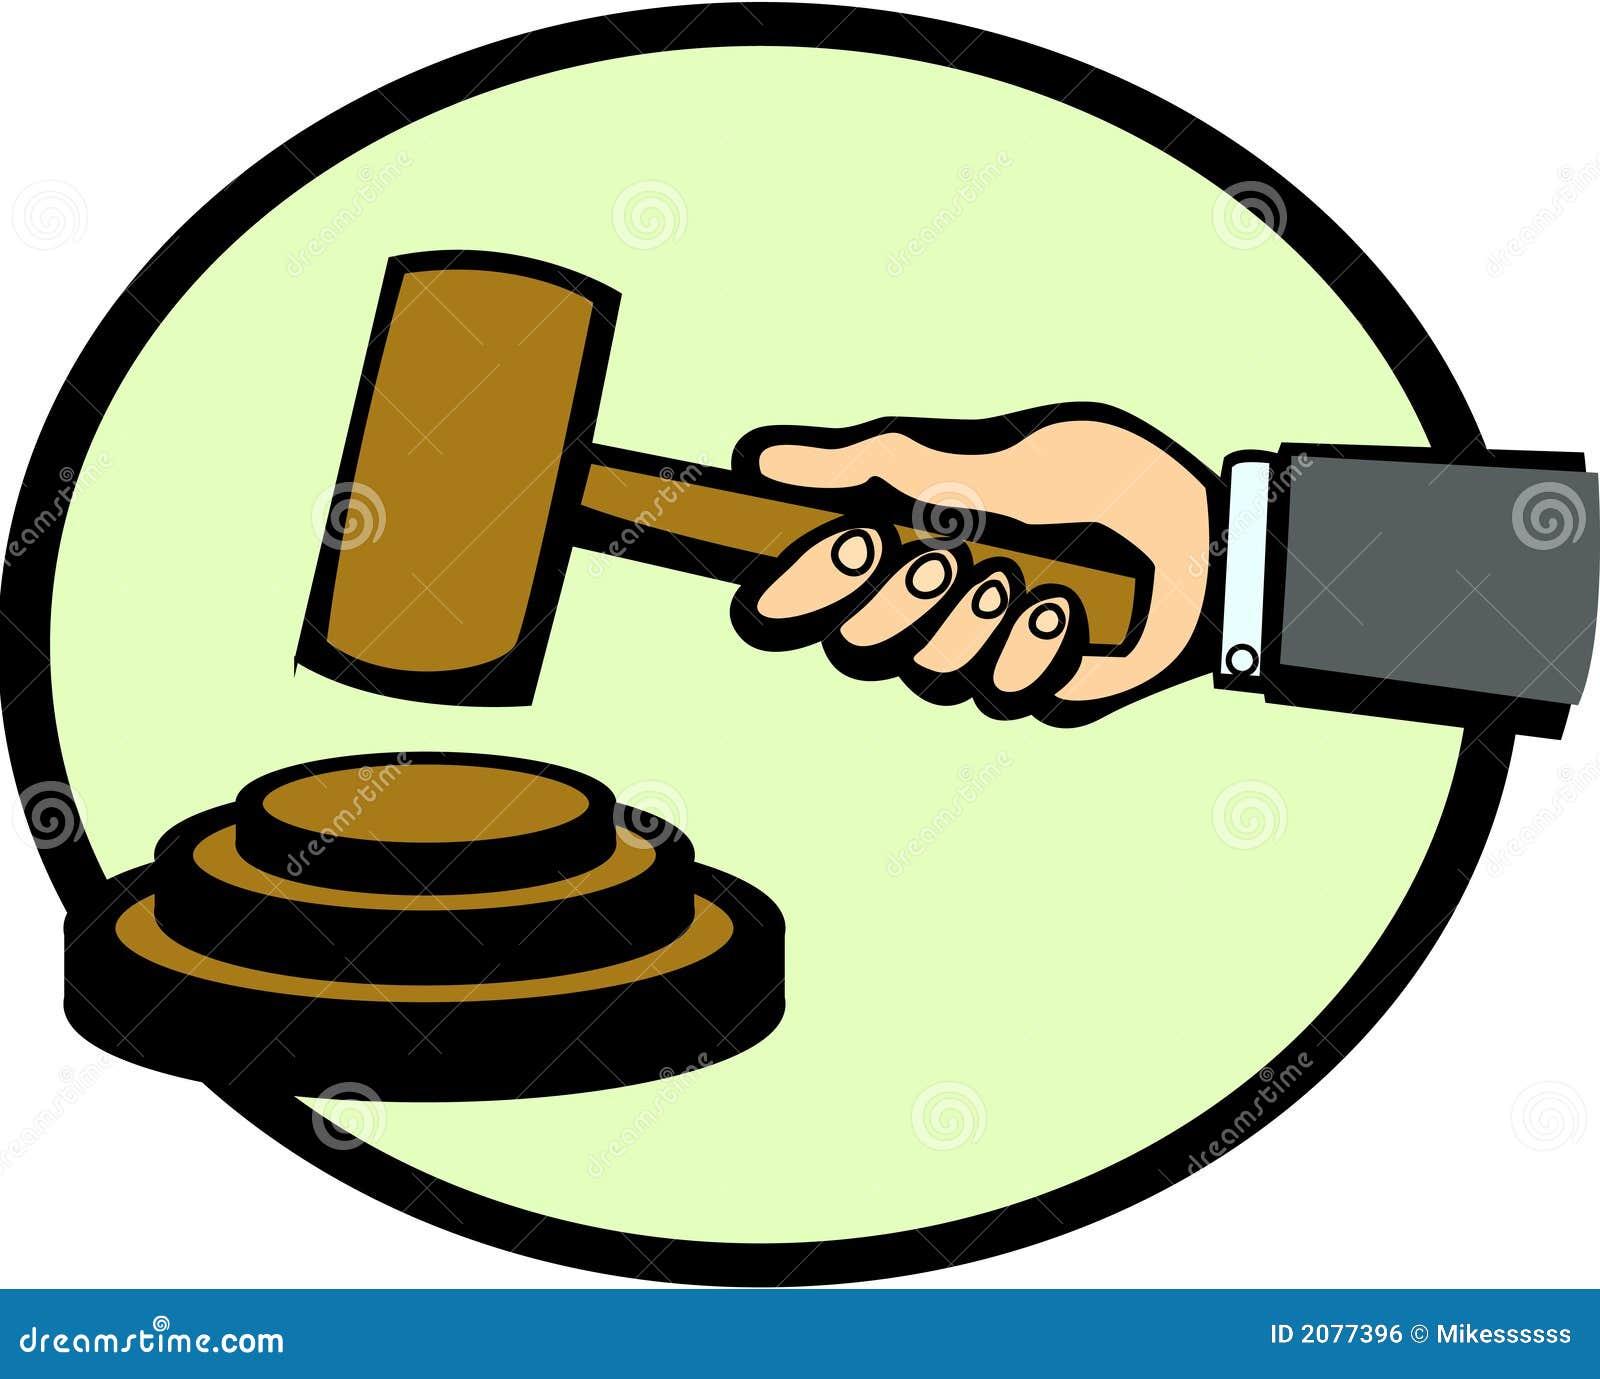 Vector Illustration Hammer: Judge Or Auction Hammer Vector Illustration Stock Vector